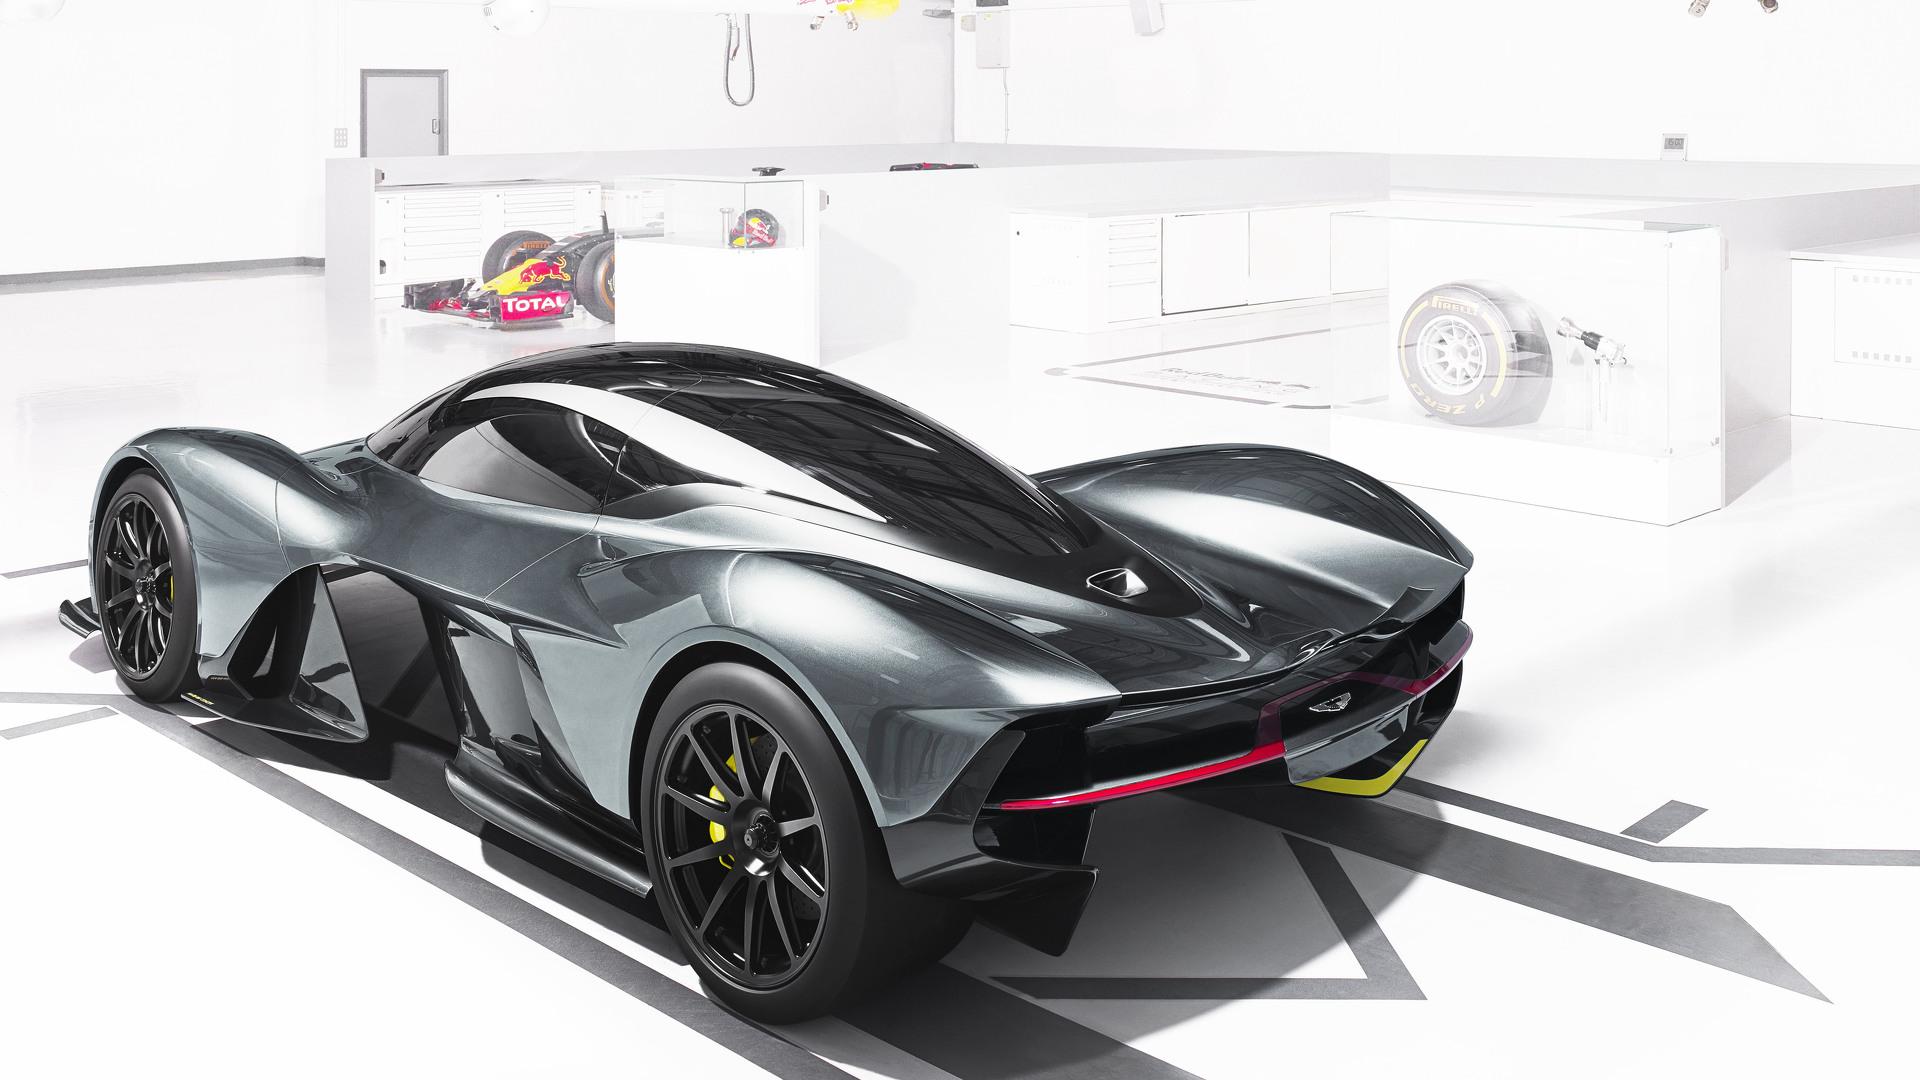 aston martin-red bull hypercar new details divulged, 0-200 mph in 10